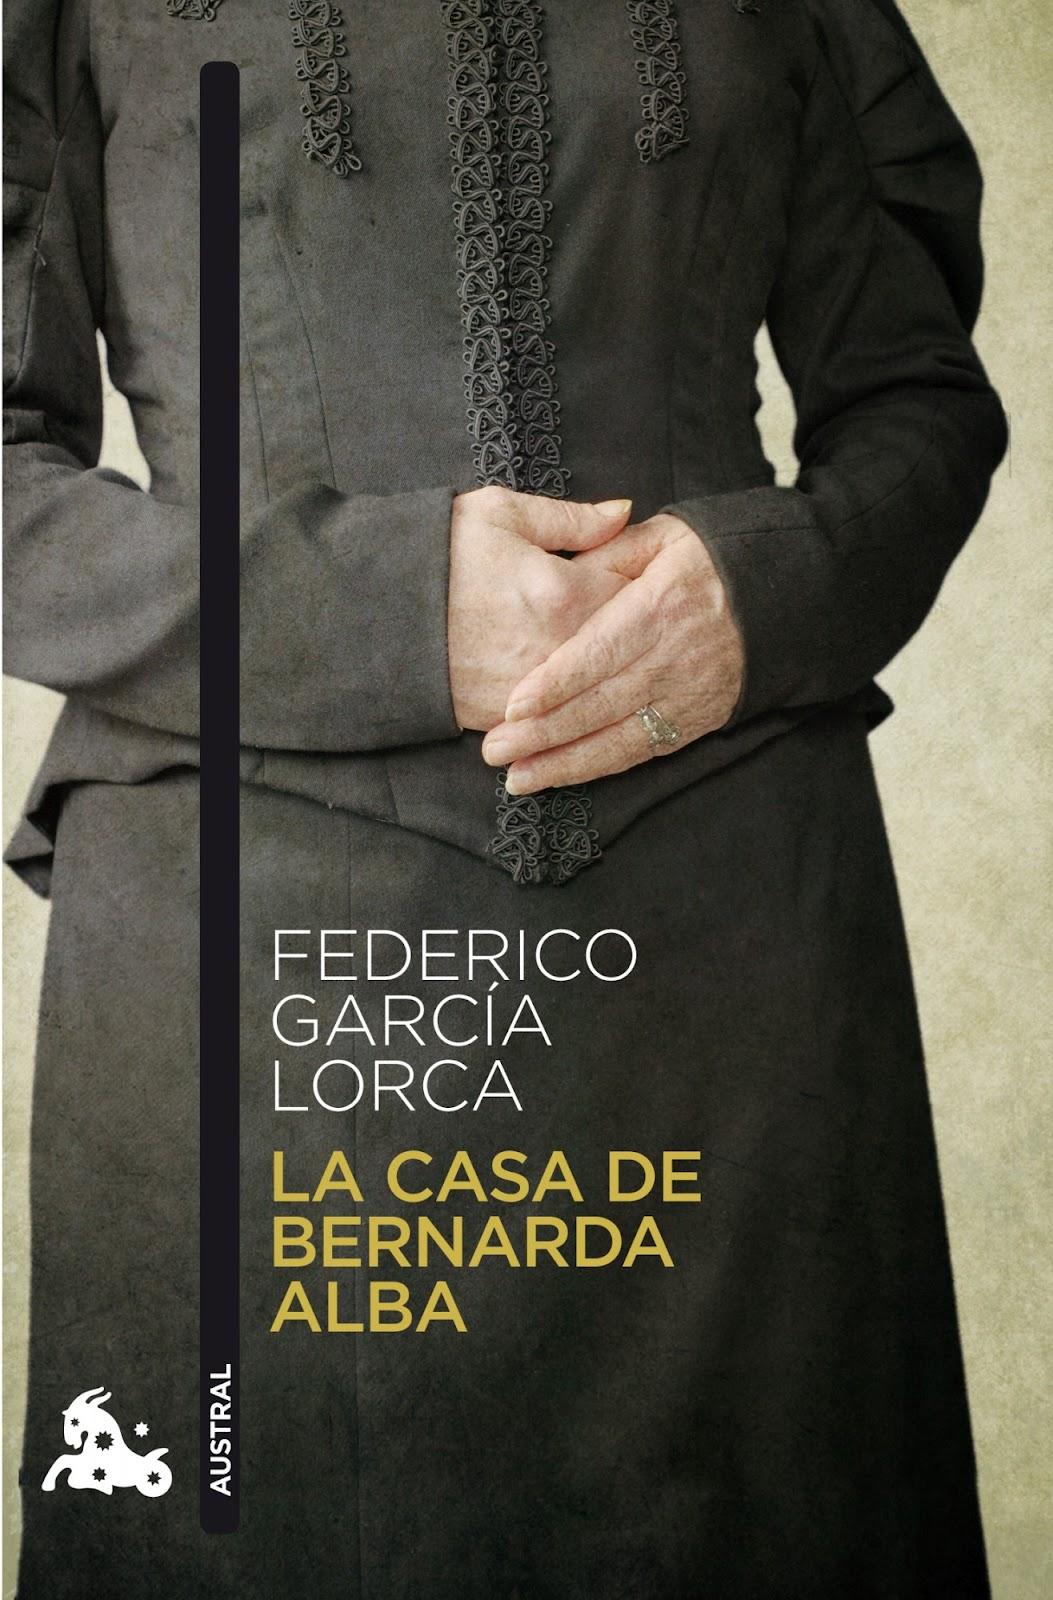 http://2.bp.blogspot.com/-QwPMVUSyyGs/UBrZlyO1hbI/AAAAAAAAJyQ/MnVSJNhb9XA/s1600/books+review+La+Casa+de+Bernarda+Alba+by+Federico+Garcia+Lorca+5+stars+play+phistars.jpg